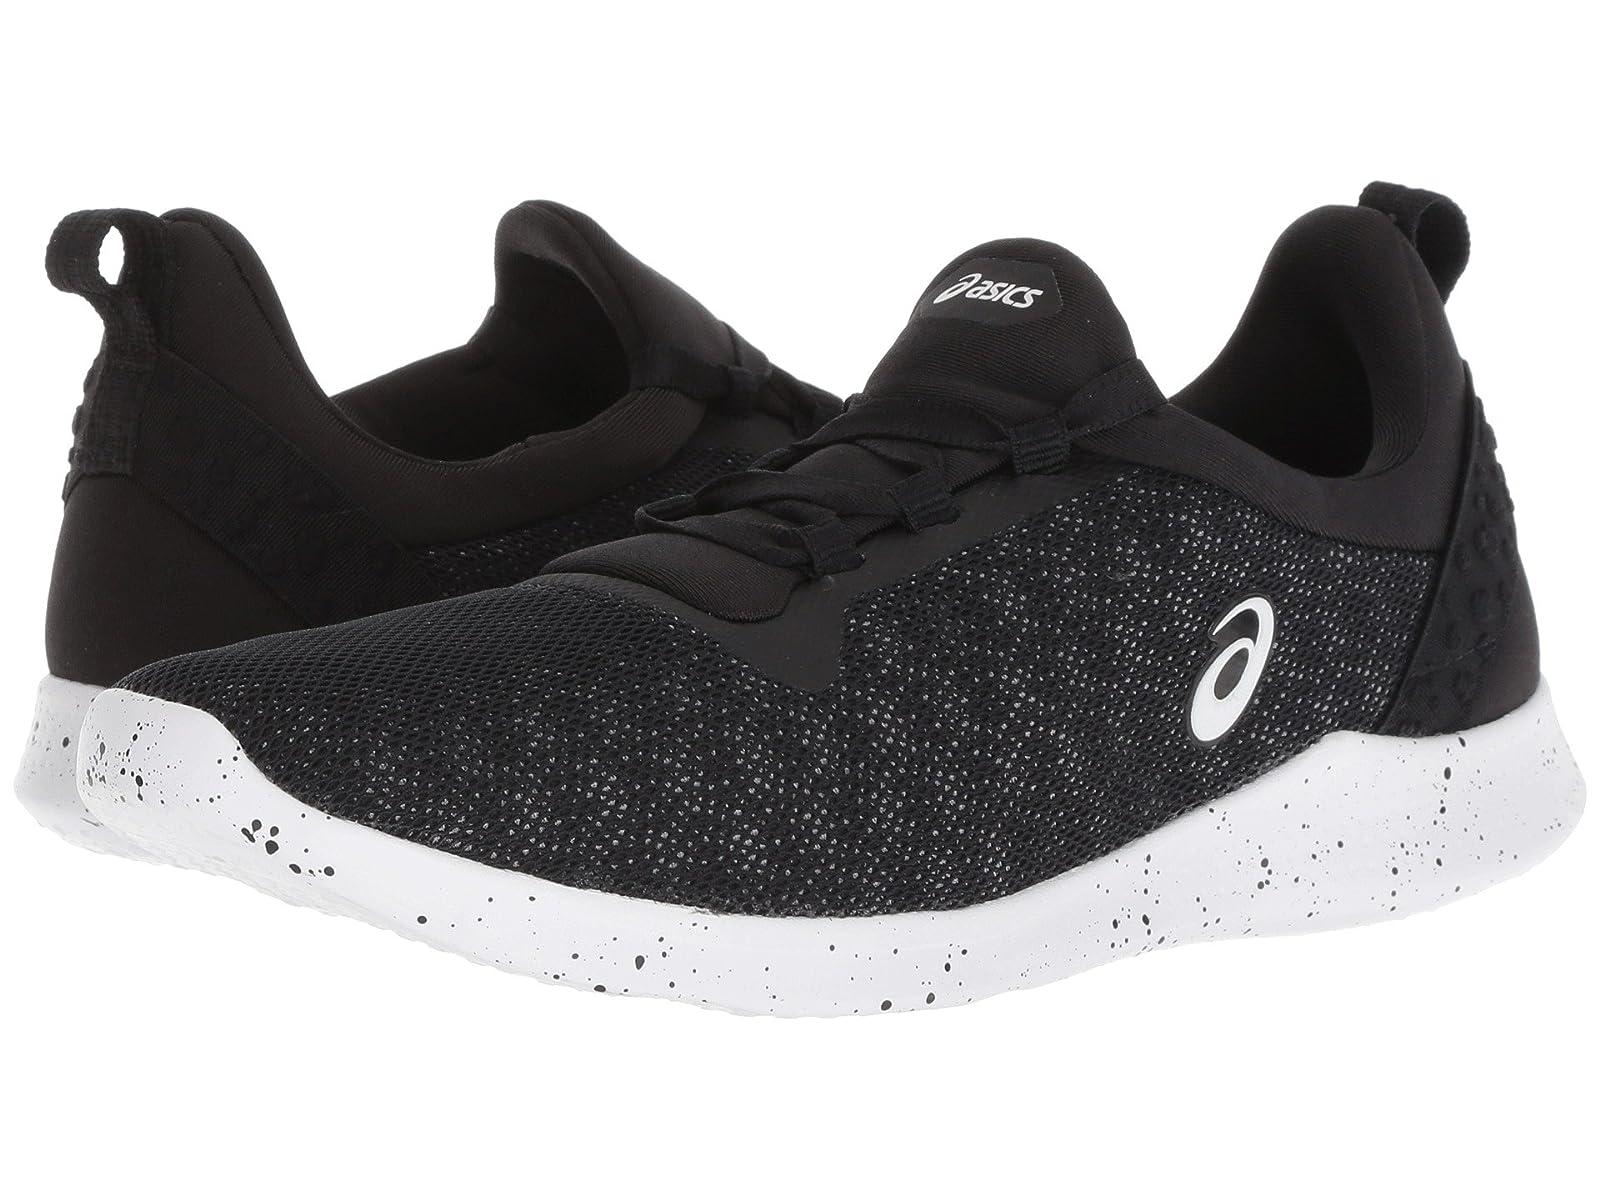 ASICS Gel-Fit Sana 4Atmospheric grades have affordable shoes